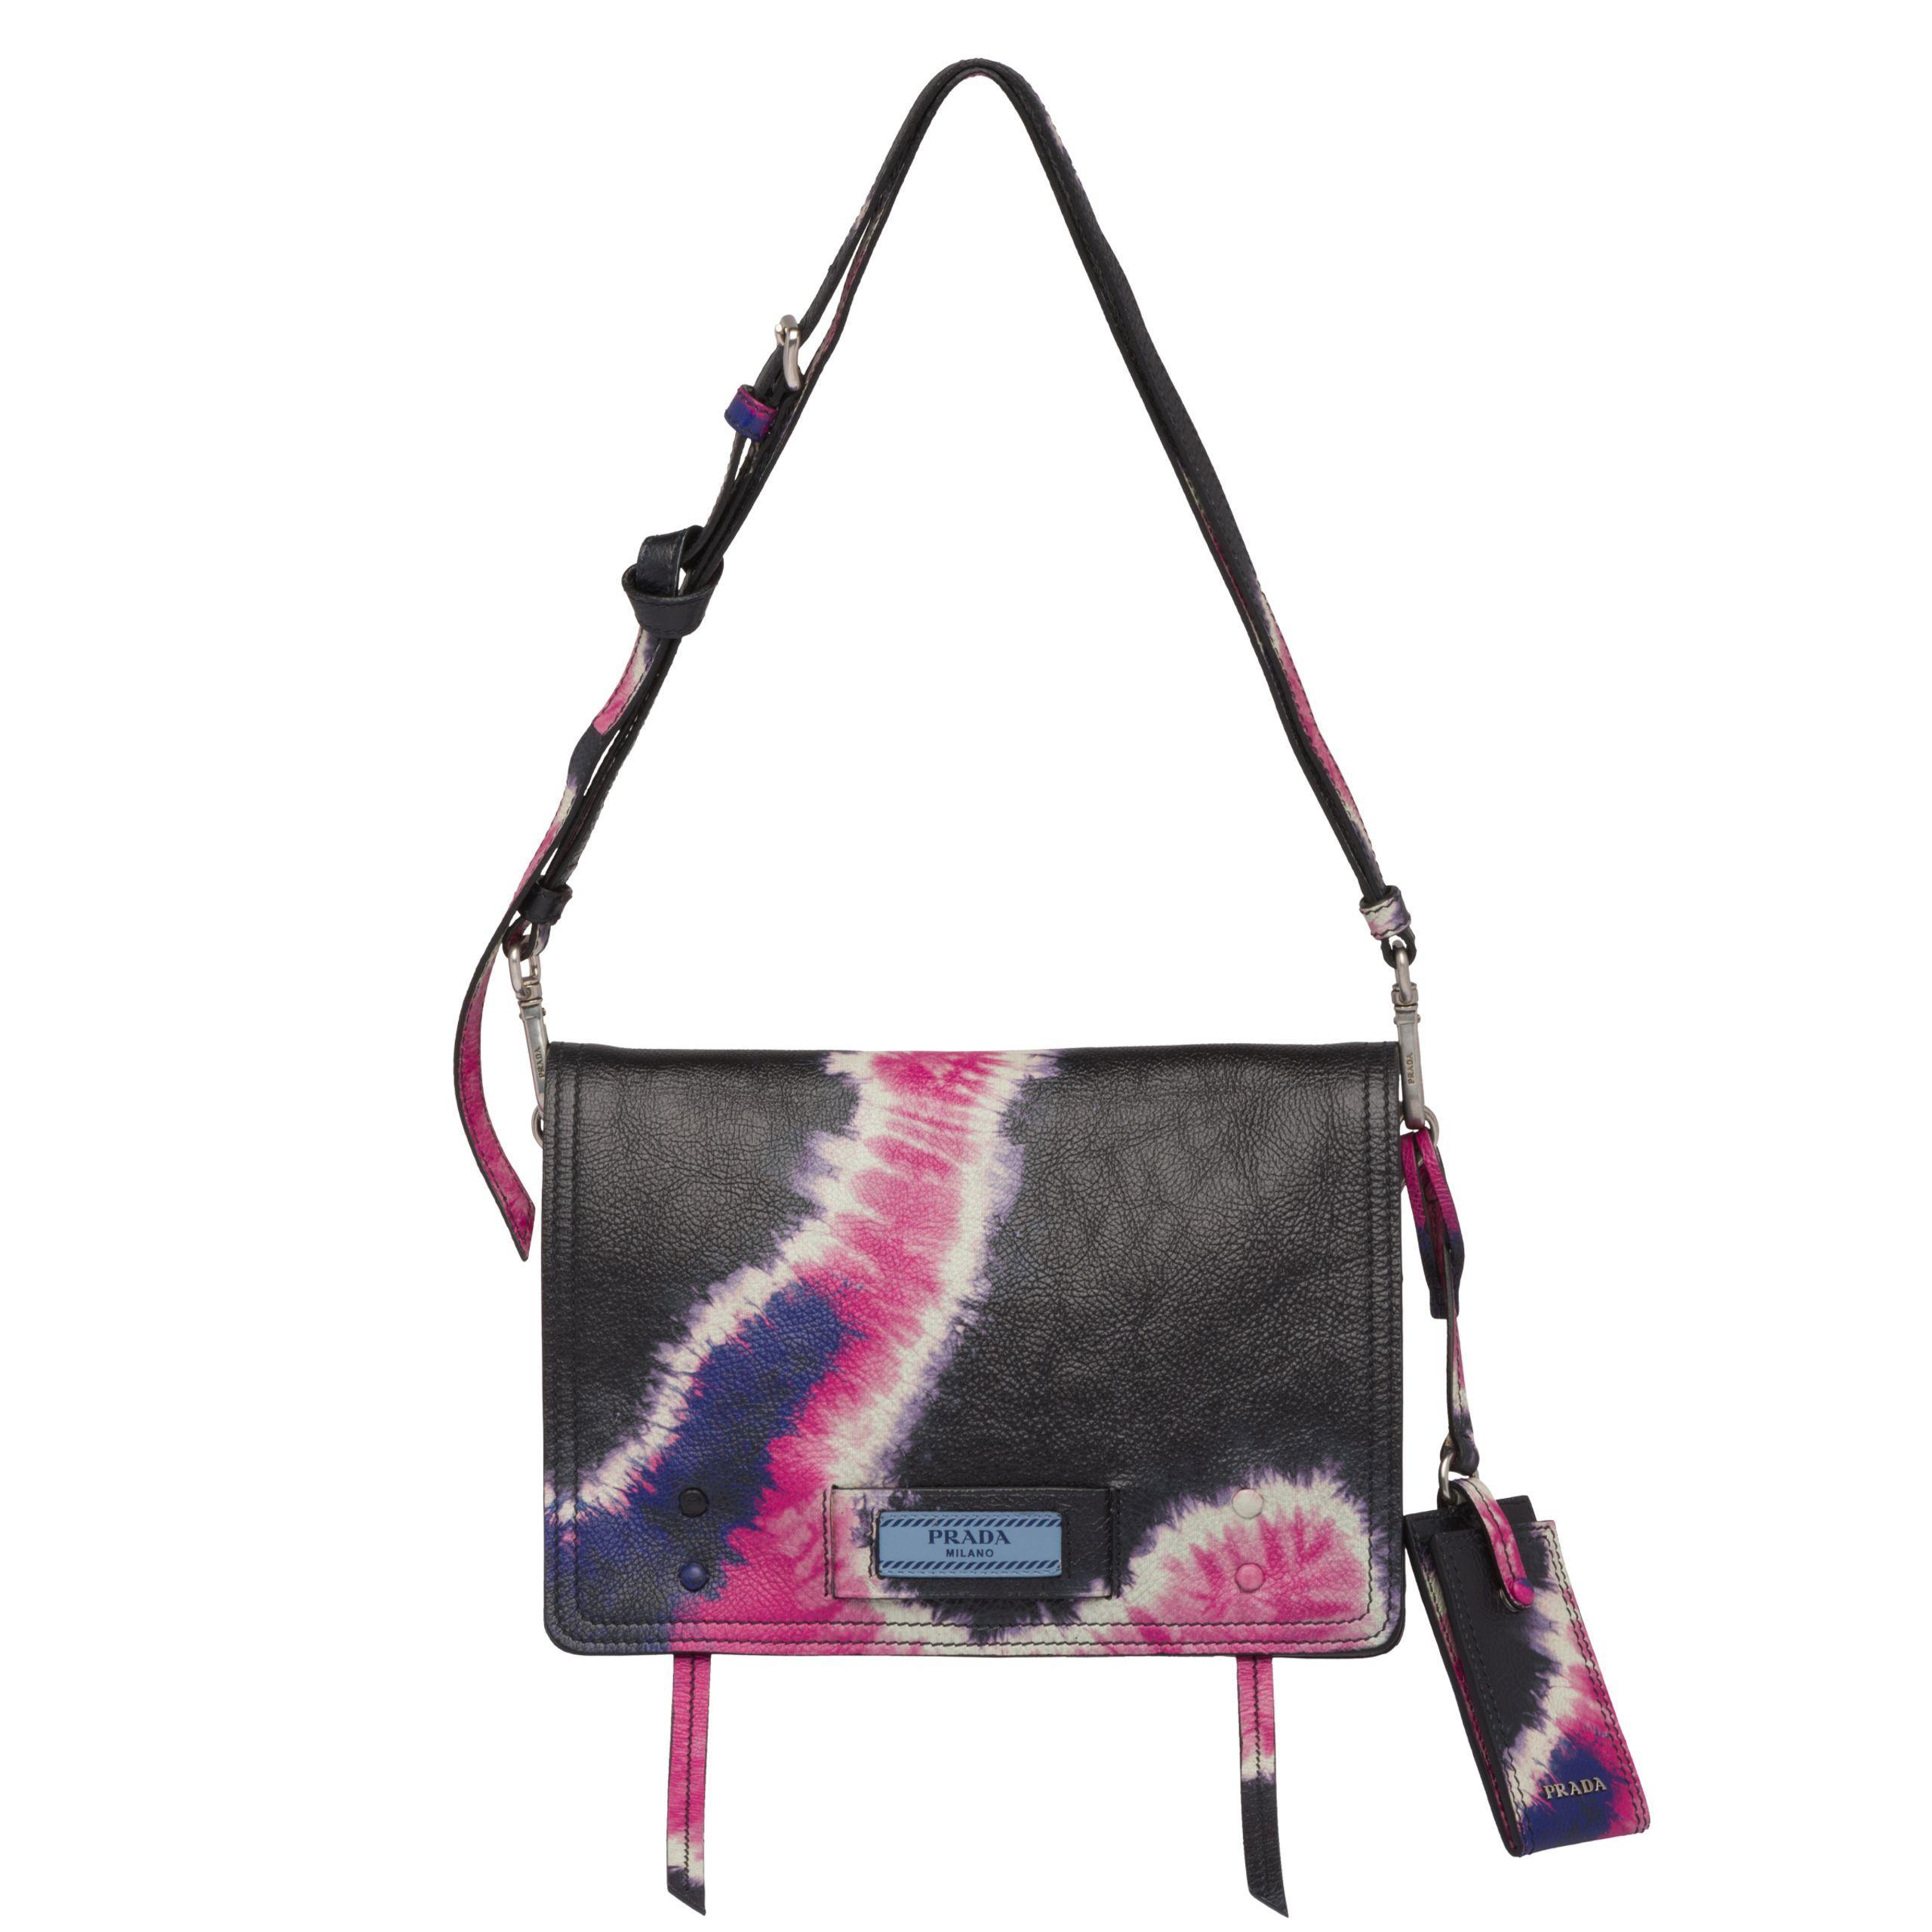 Lyst - Prada Etiquette Printed Leather Bag